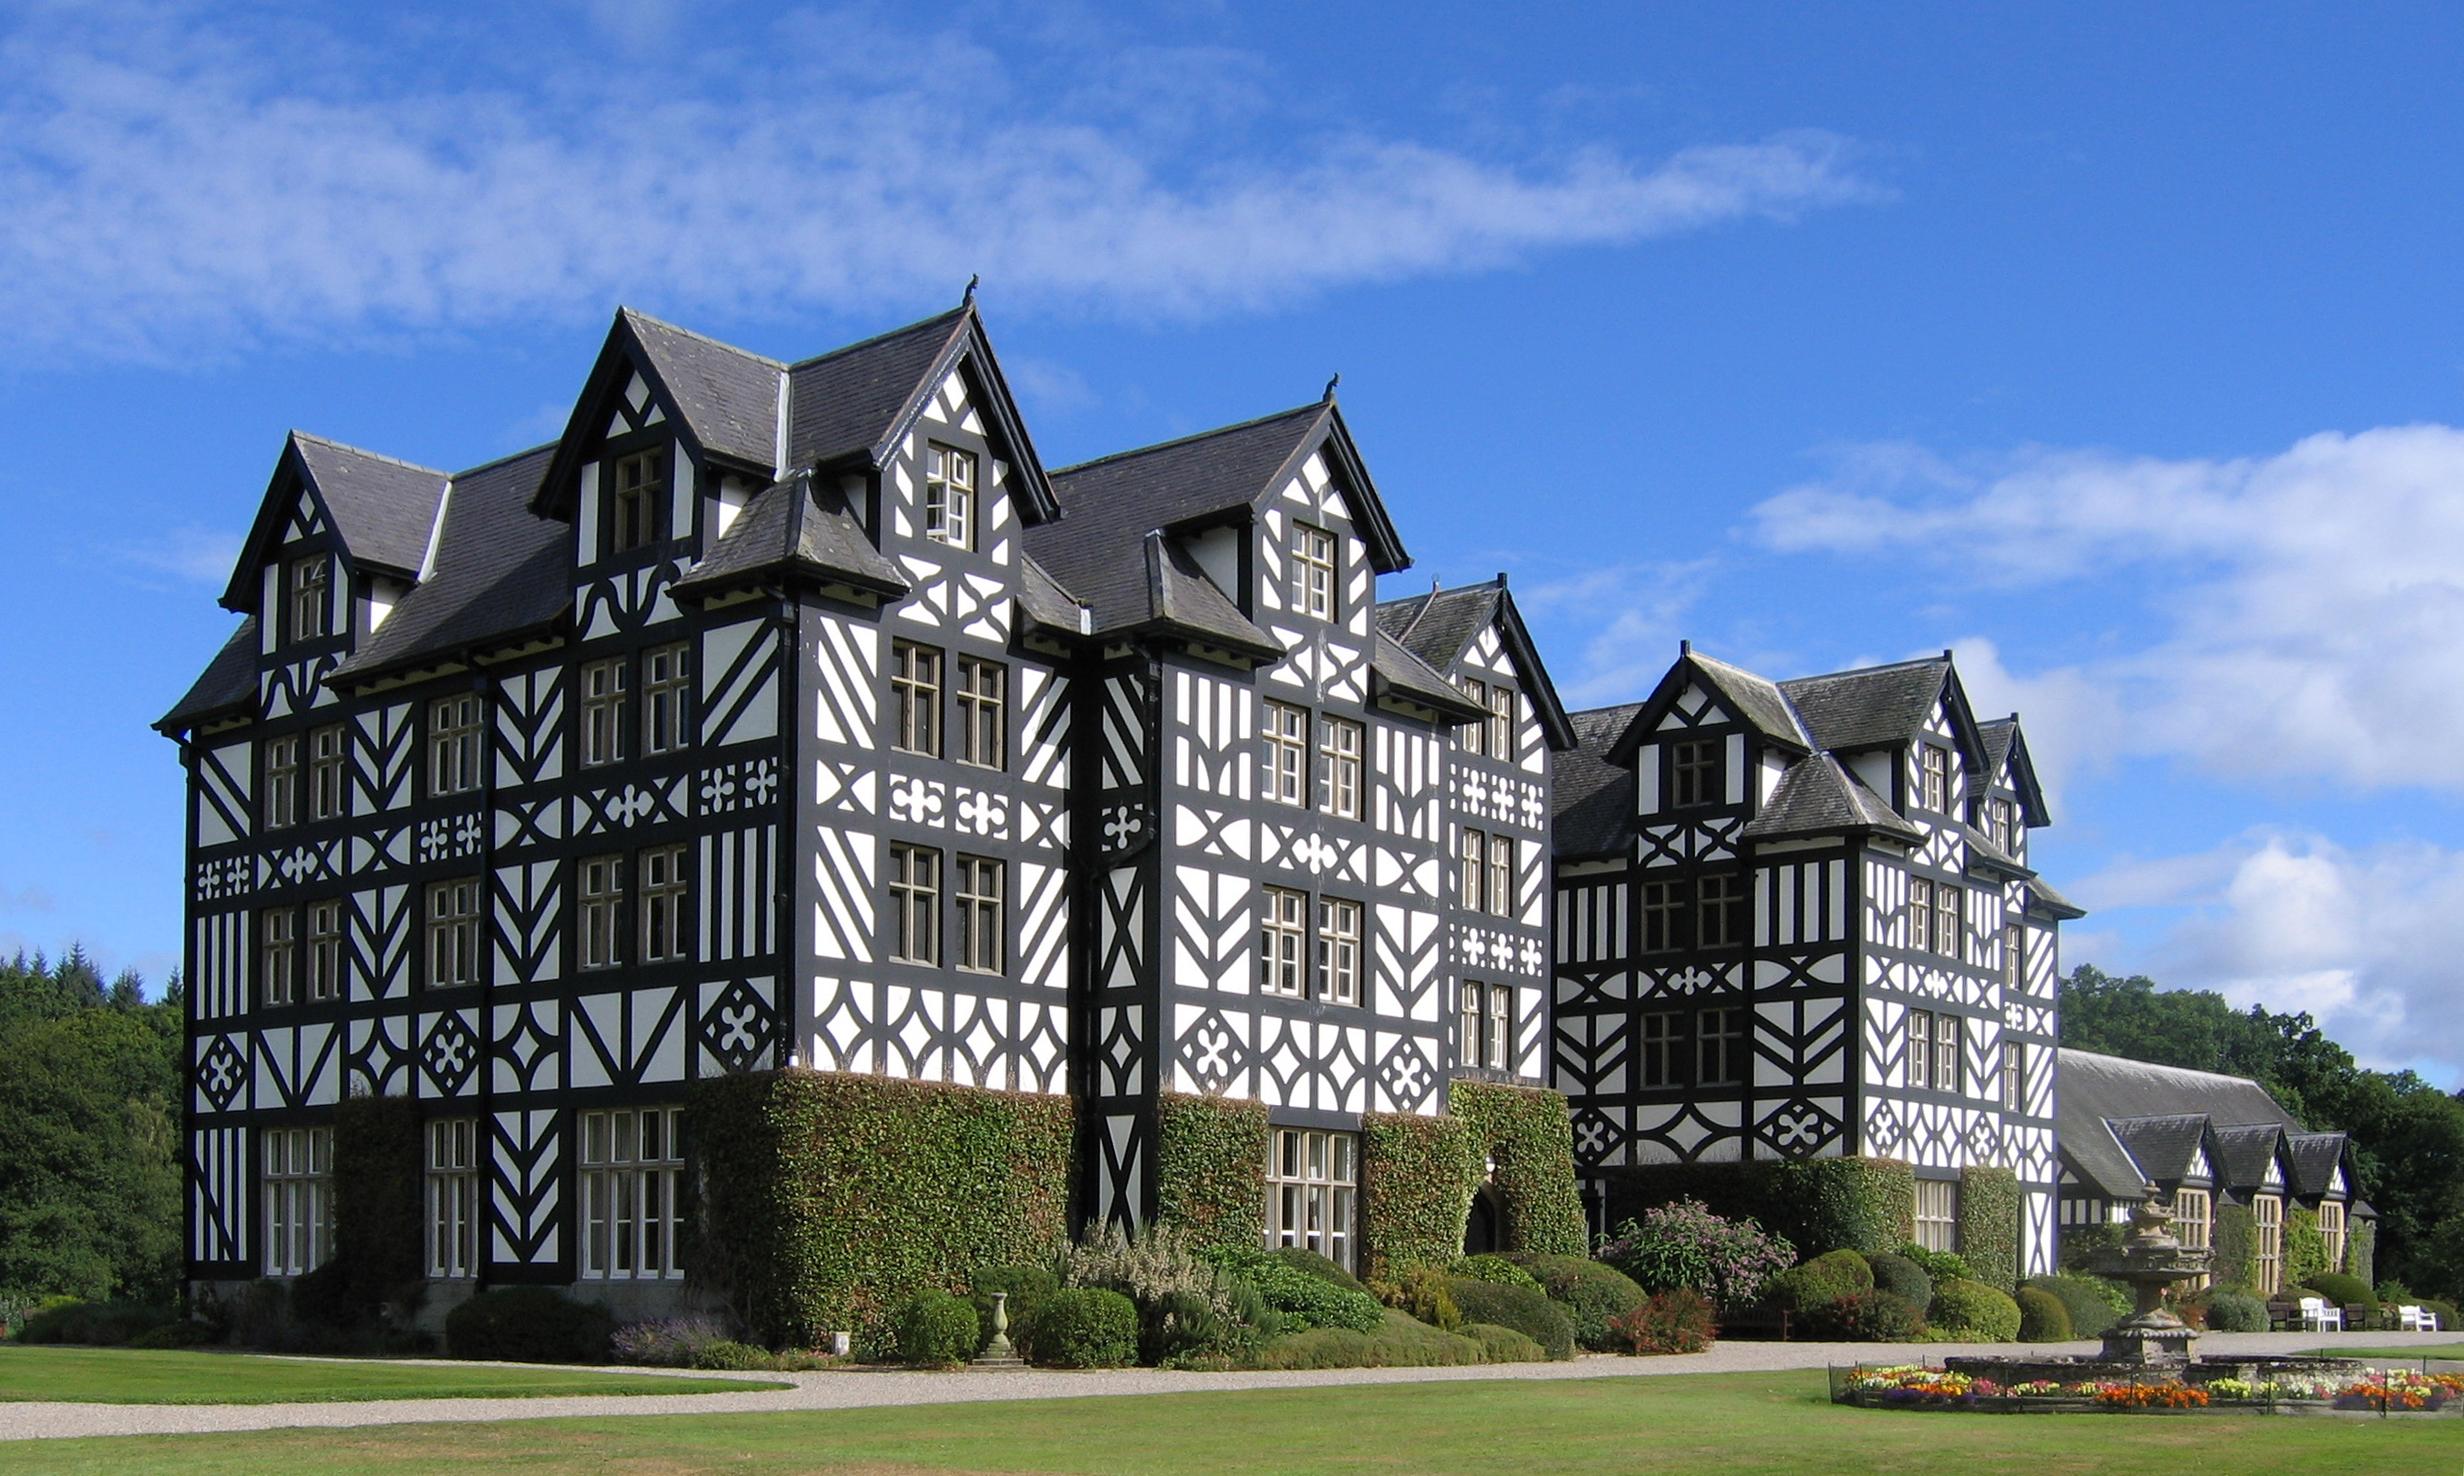 Aberystwyth University Buildings